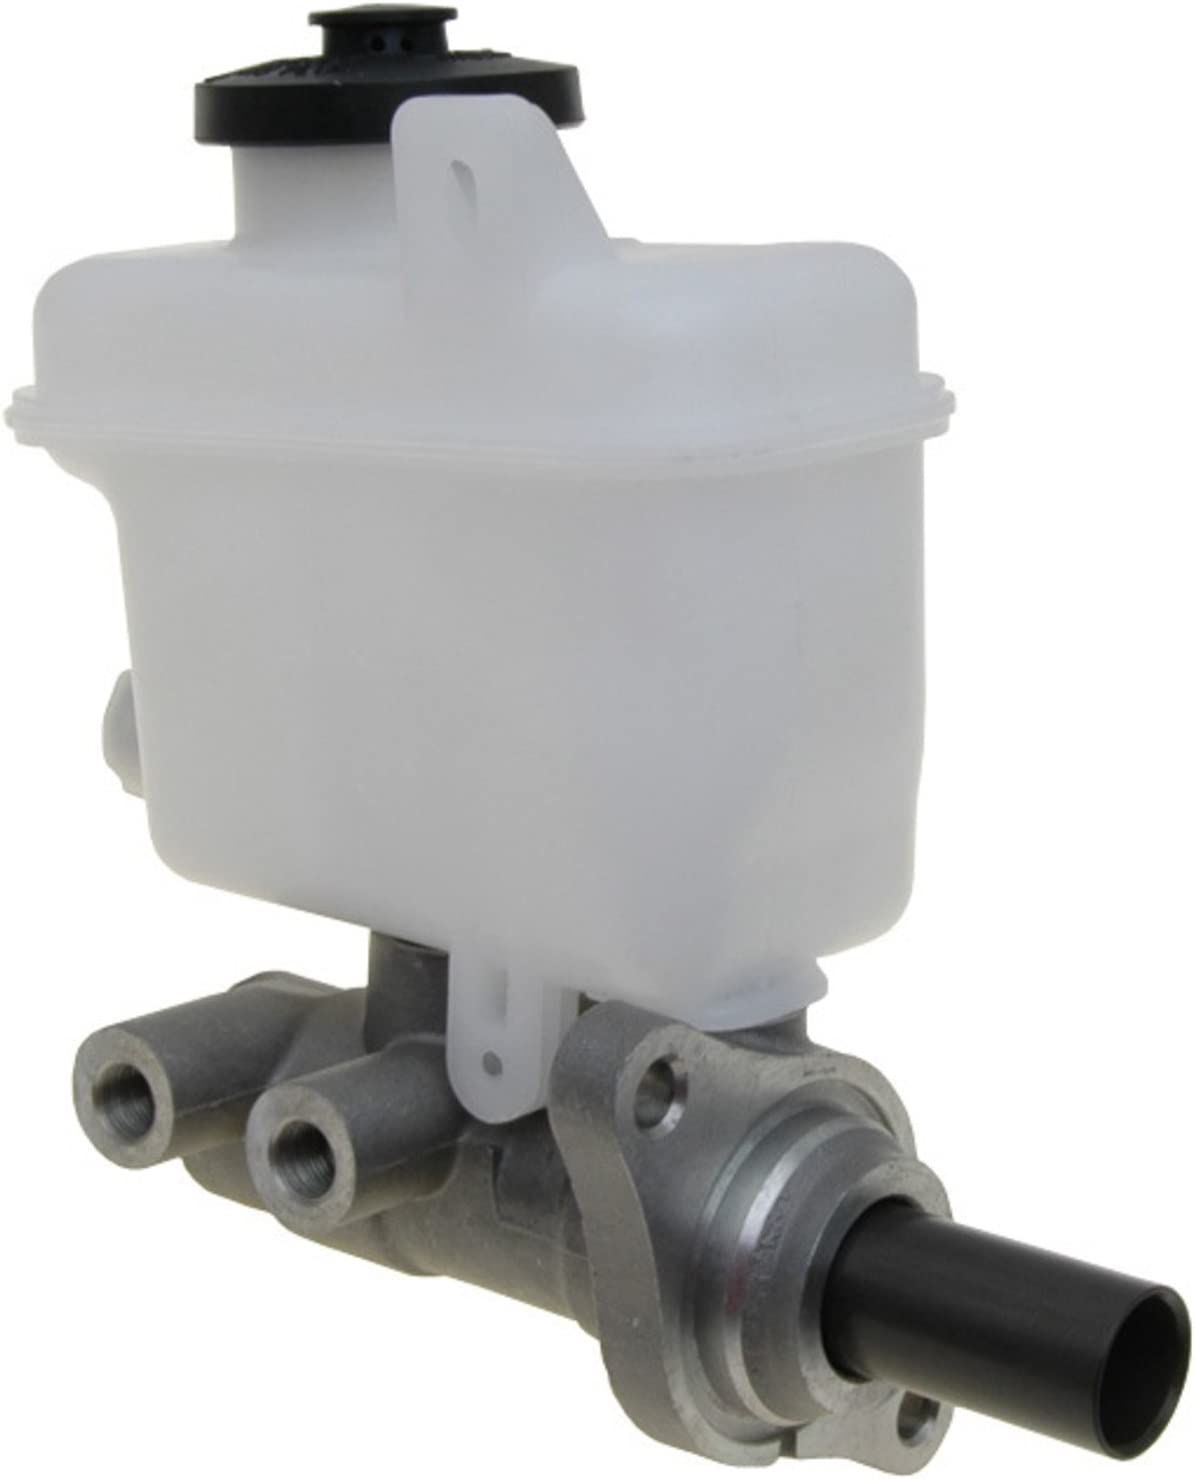 Acdelco 18M391085 Professional Brake Master Cylinder